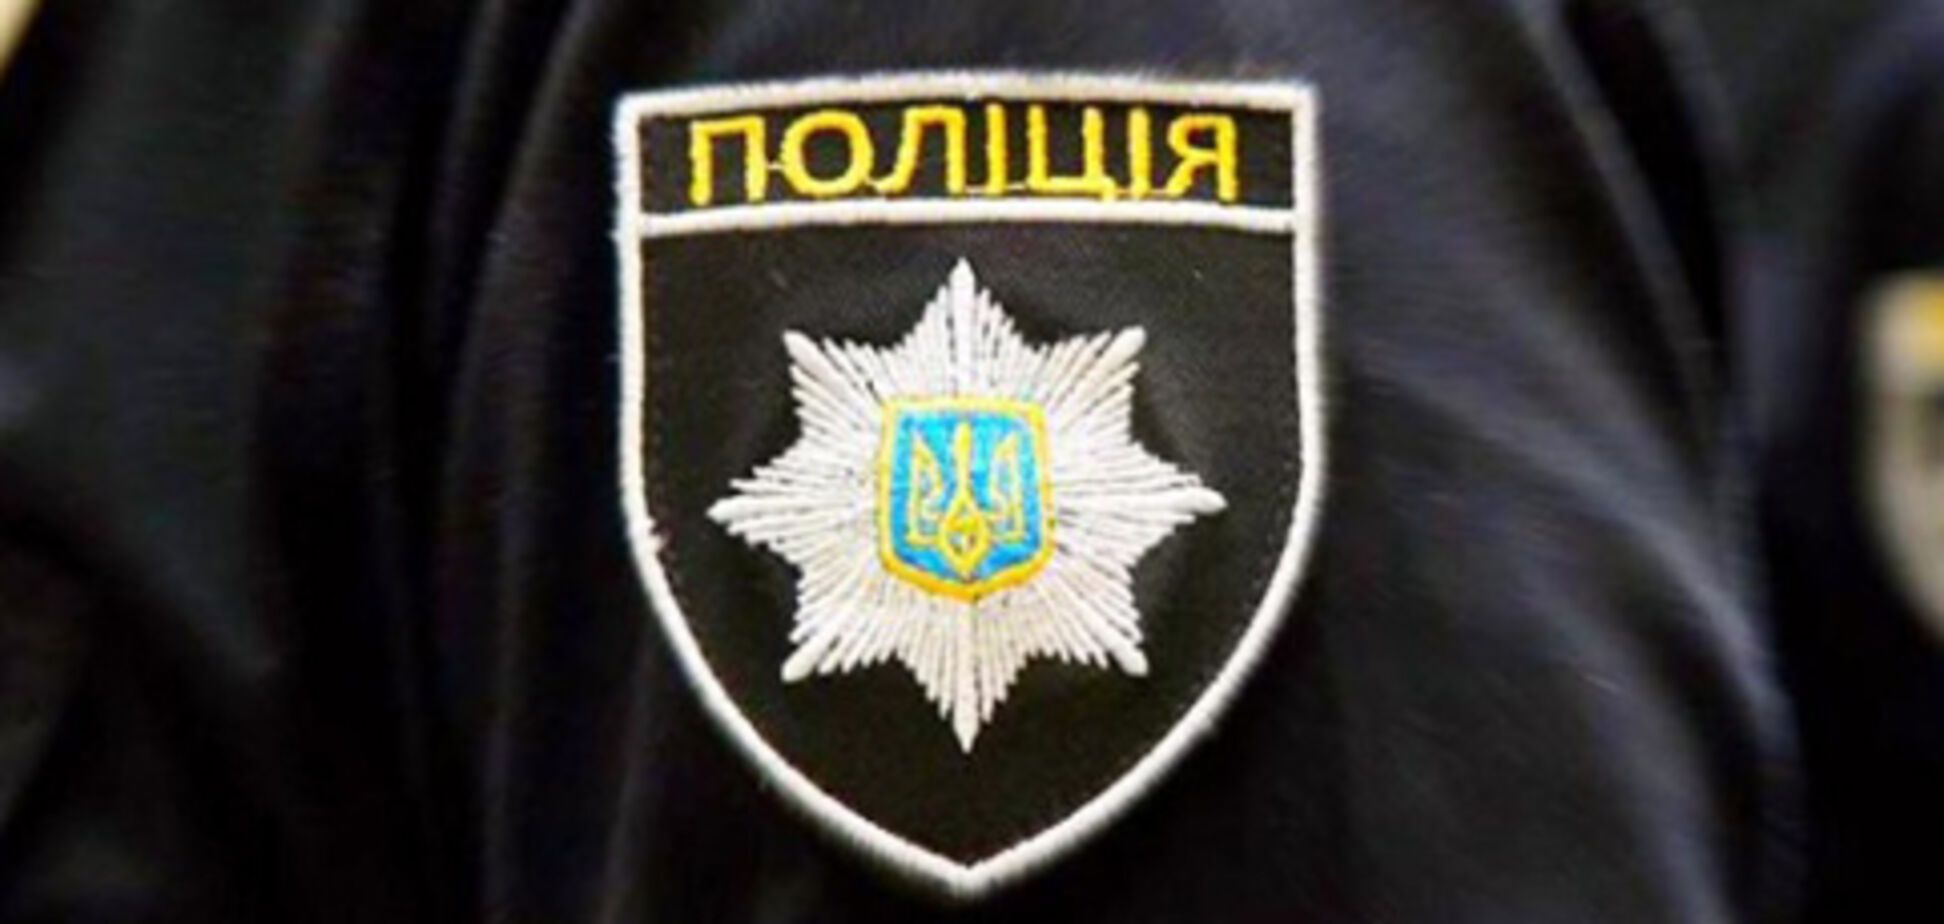 Под Днепром двое мужчин подорвались на гранате: подробности ЧП